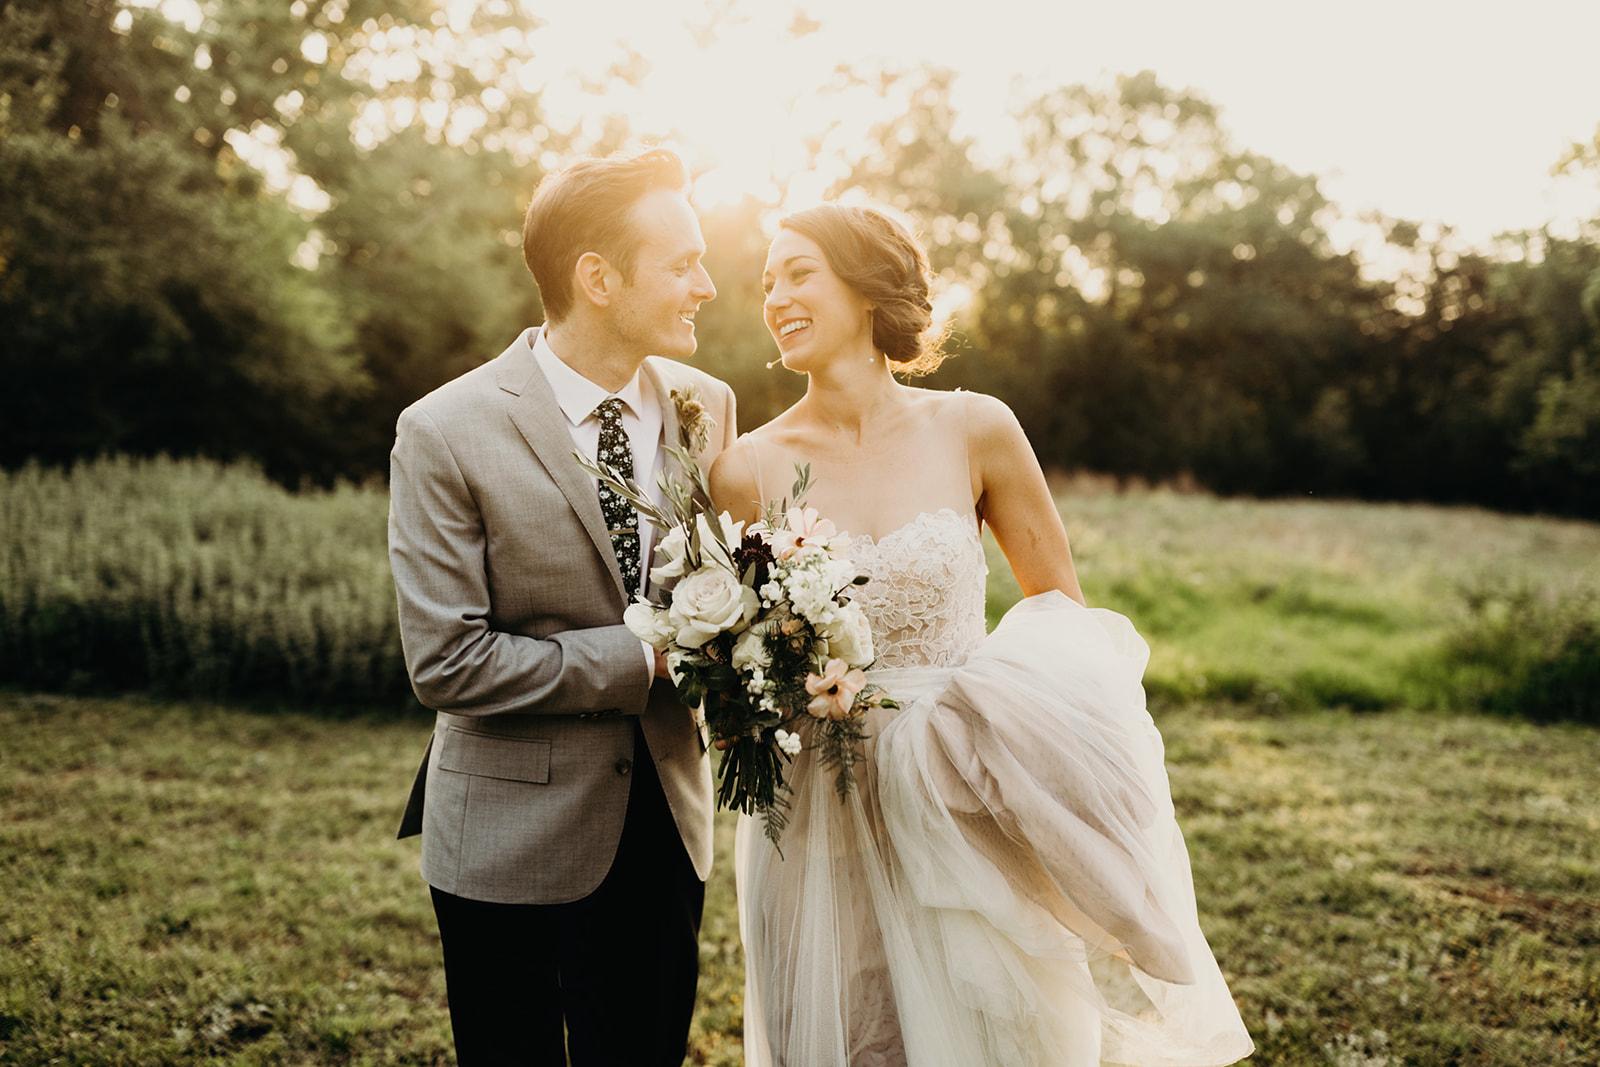 austin-wedding-lindsey-bryce-501.jpg